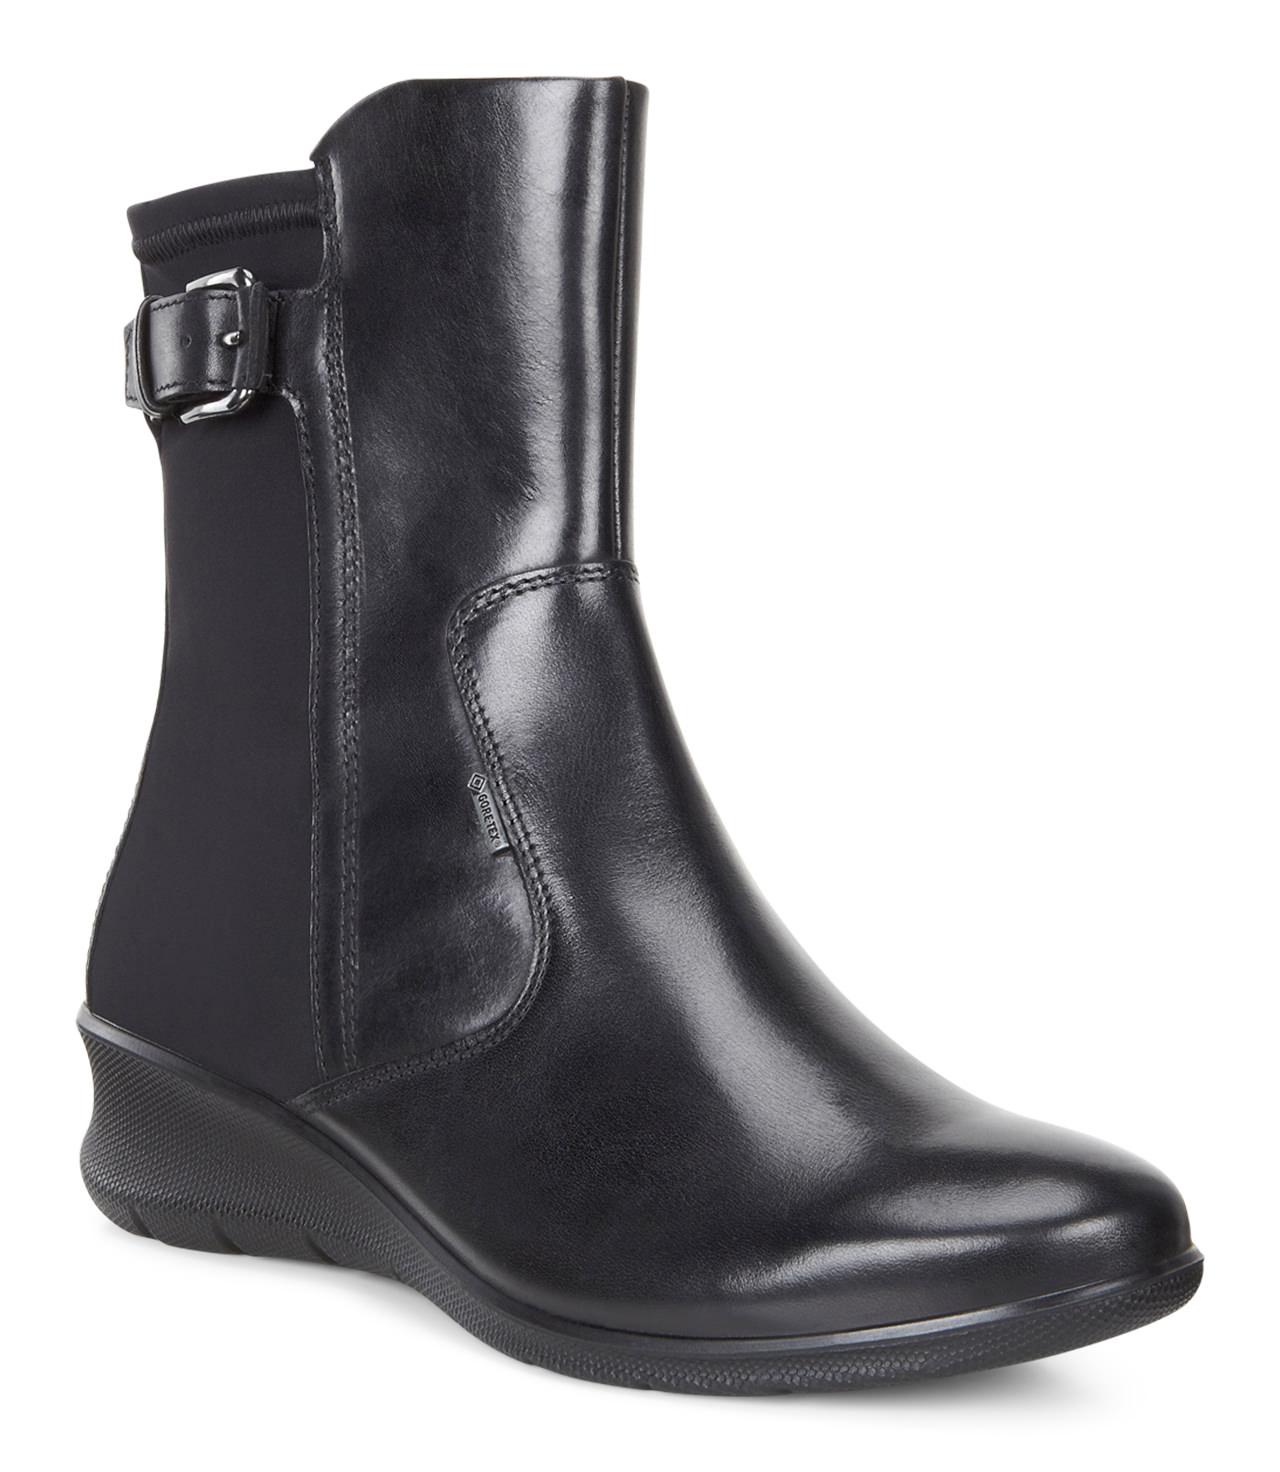 0e3dd5e4216 ECCO BABETT WEDGE Women Shoes GORE-TEX®